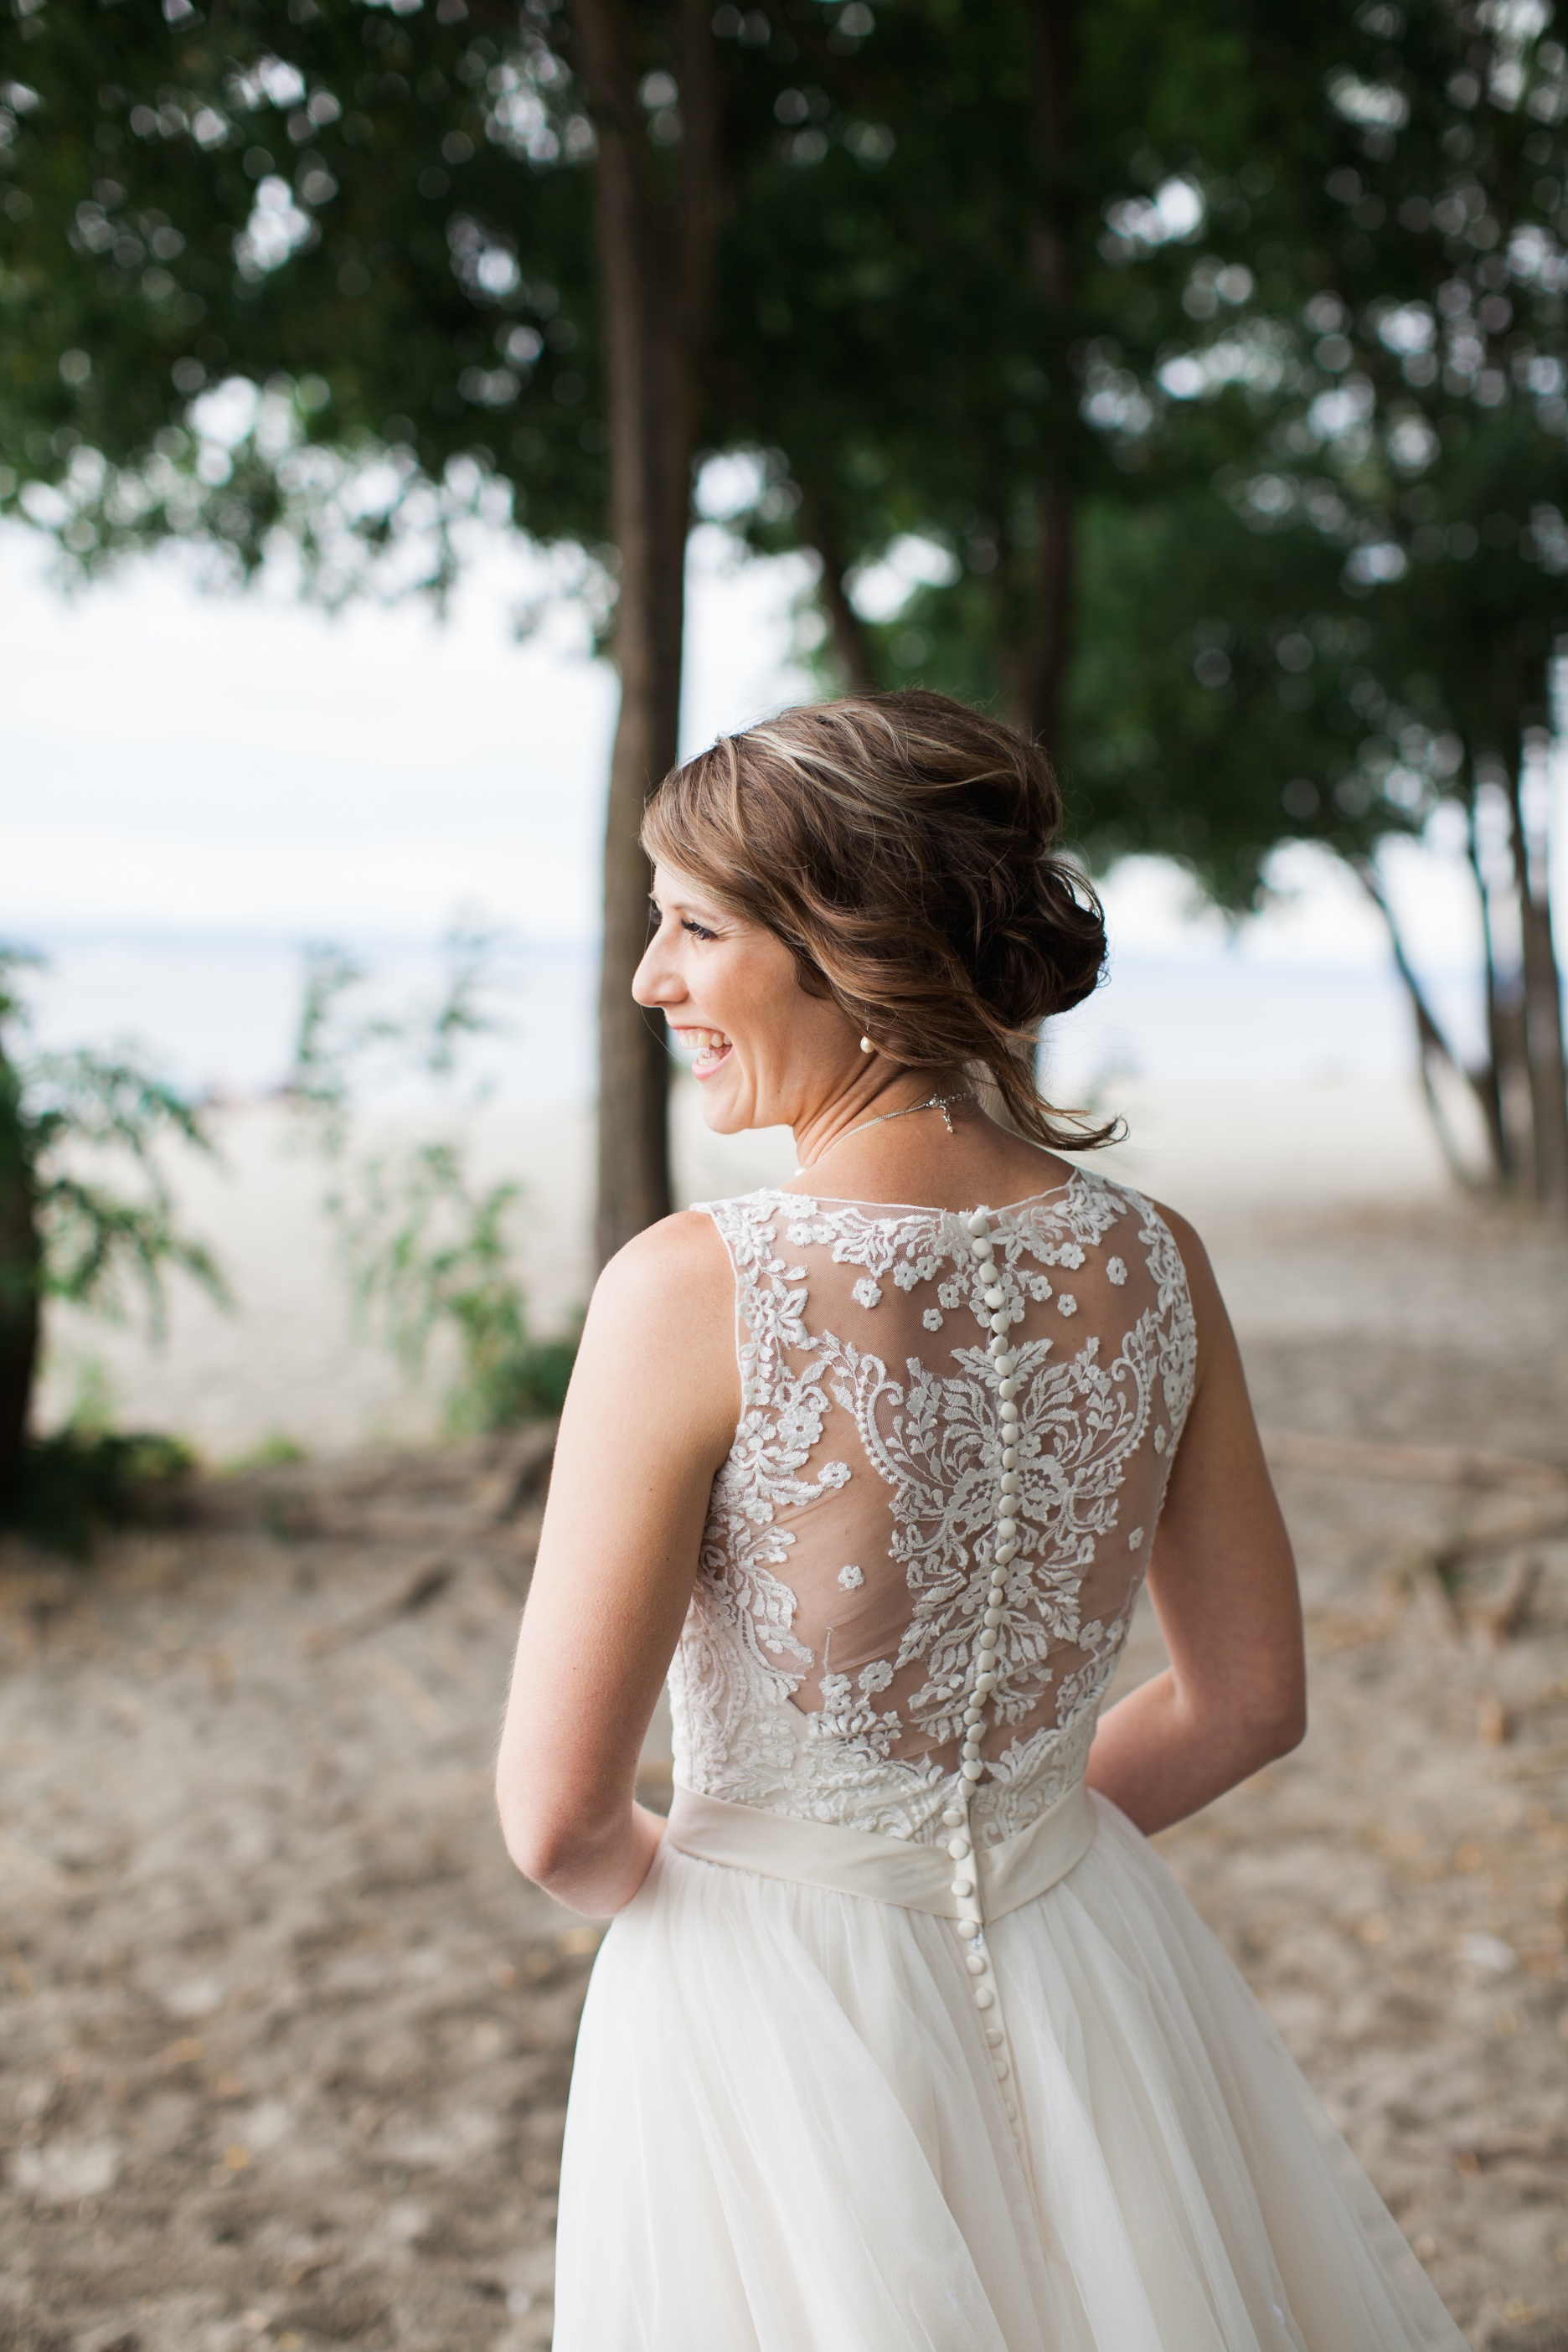 seattle wedding photographer film photography golden garden gardens state park ocean sand bride groom 2.jpg